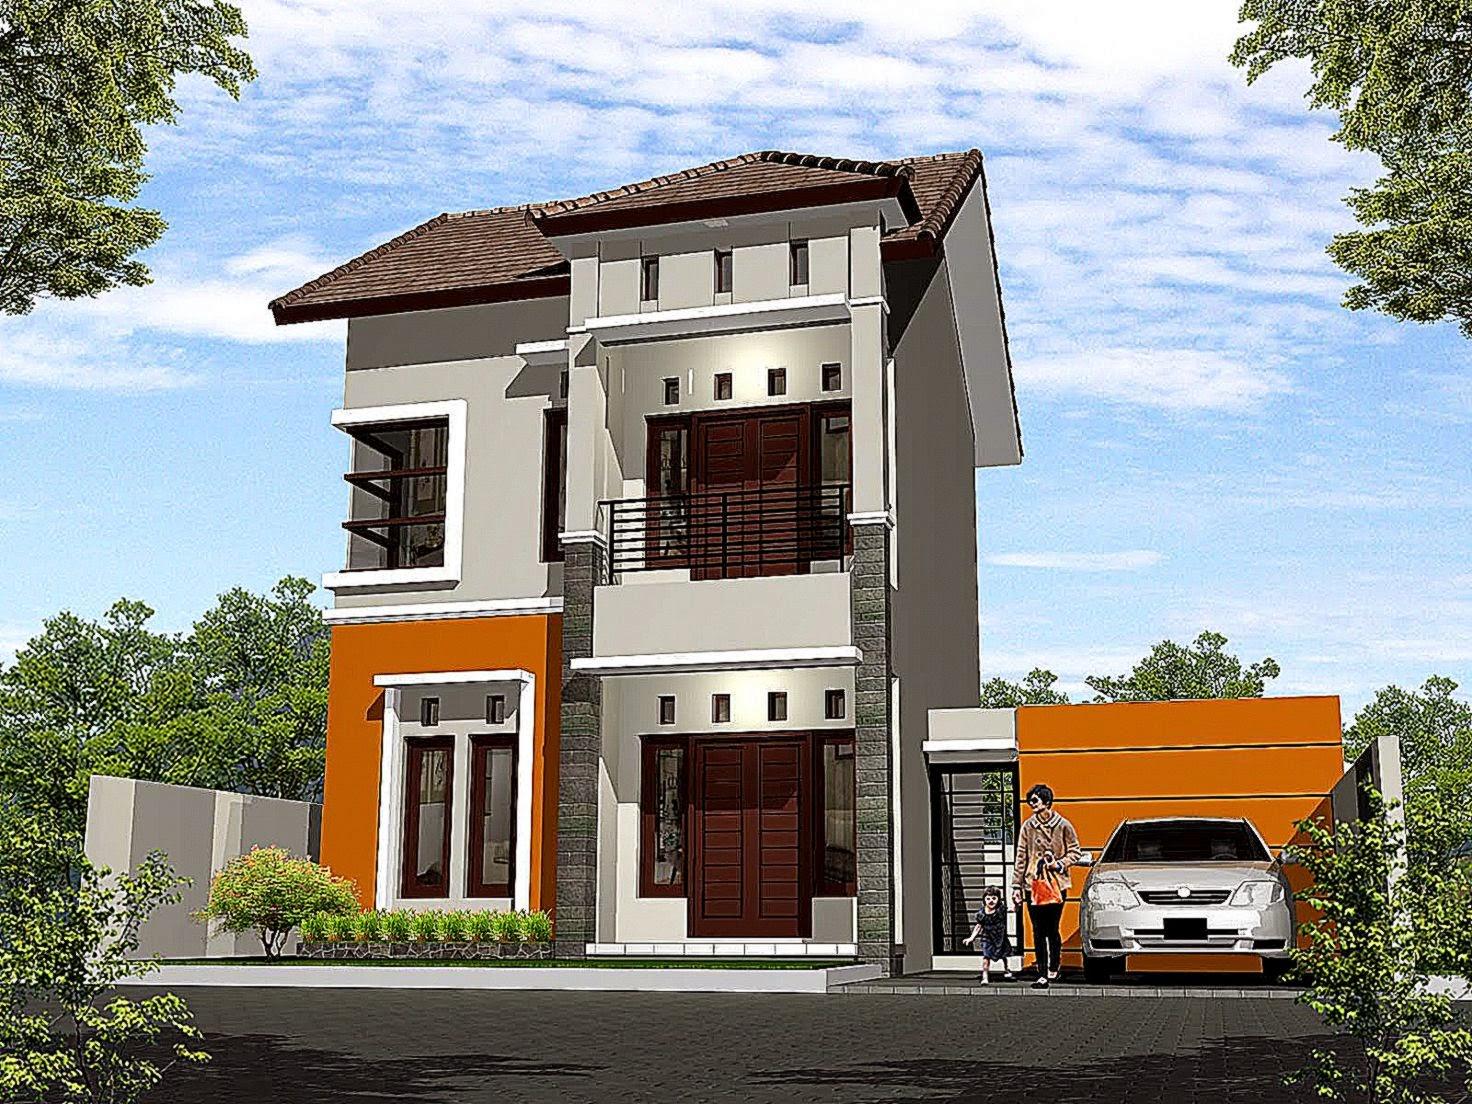 Gambar Denah Rumah 2 Lantai Minimalis  Design Arsitektur 2015